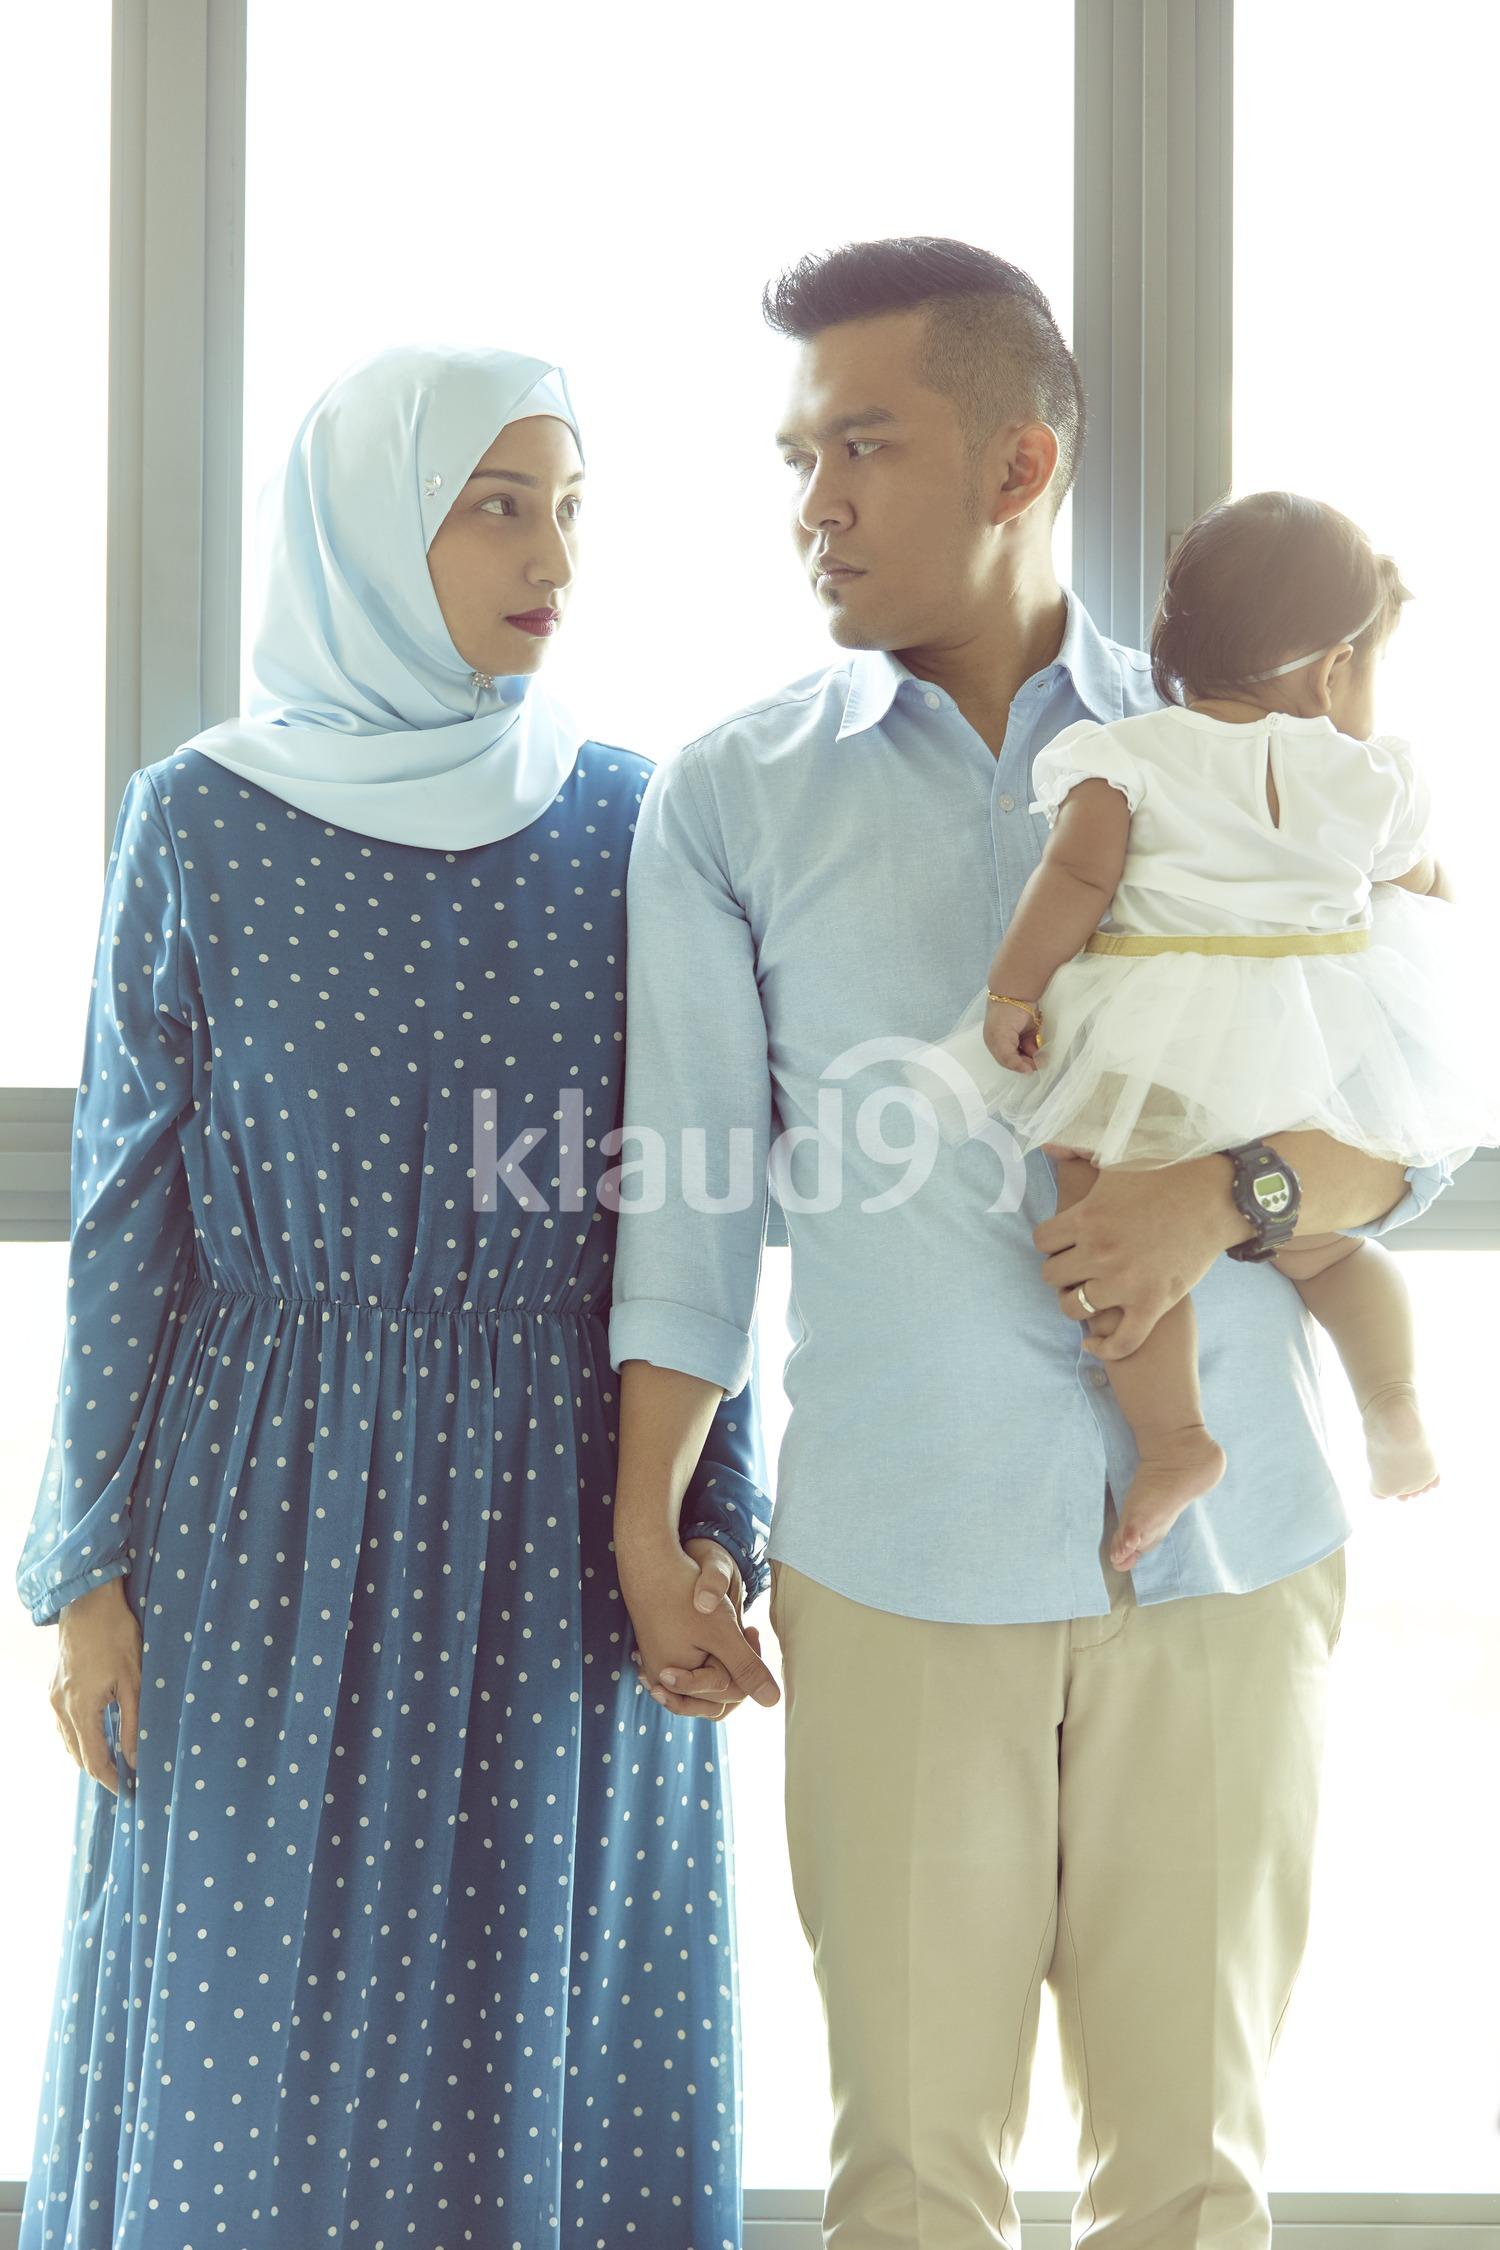 Malay family potrait